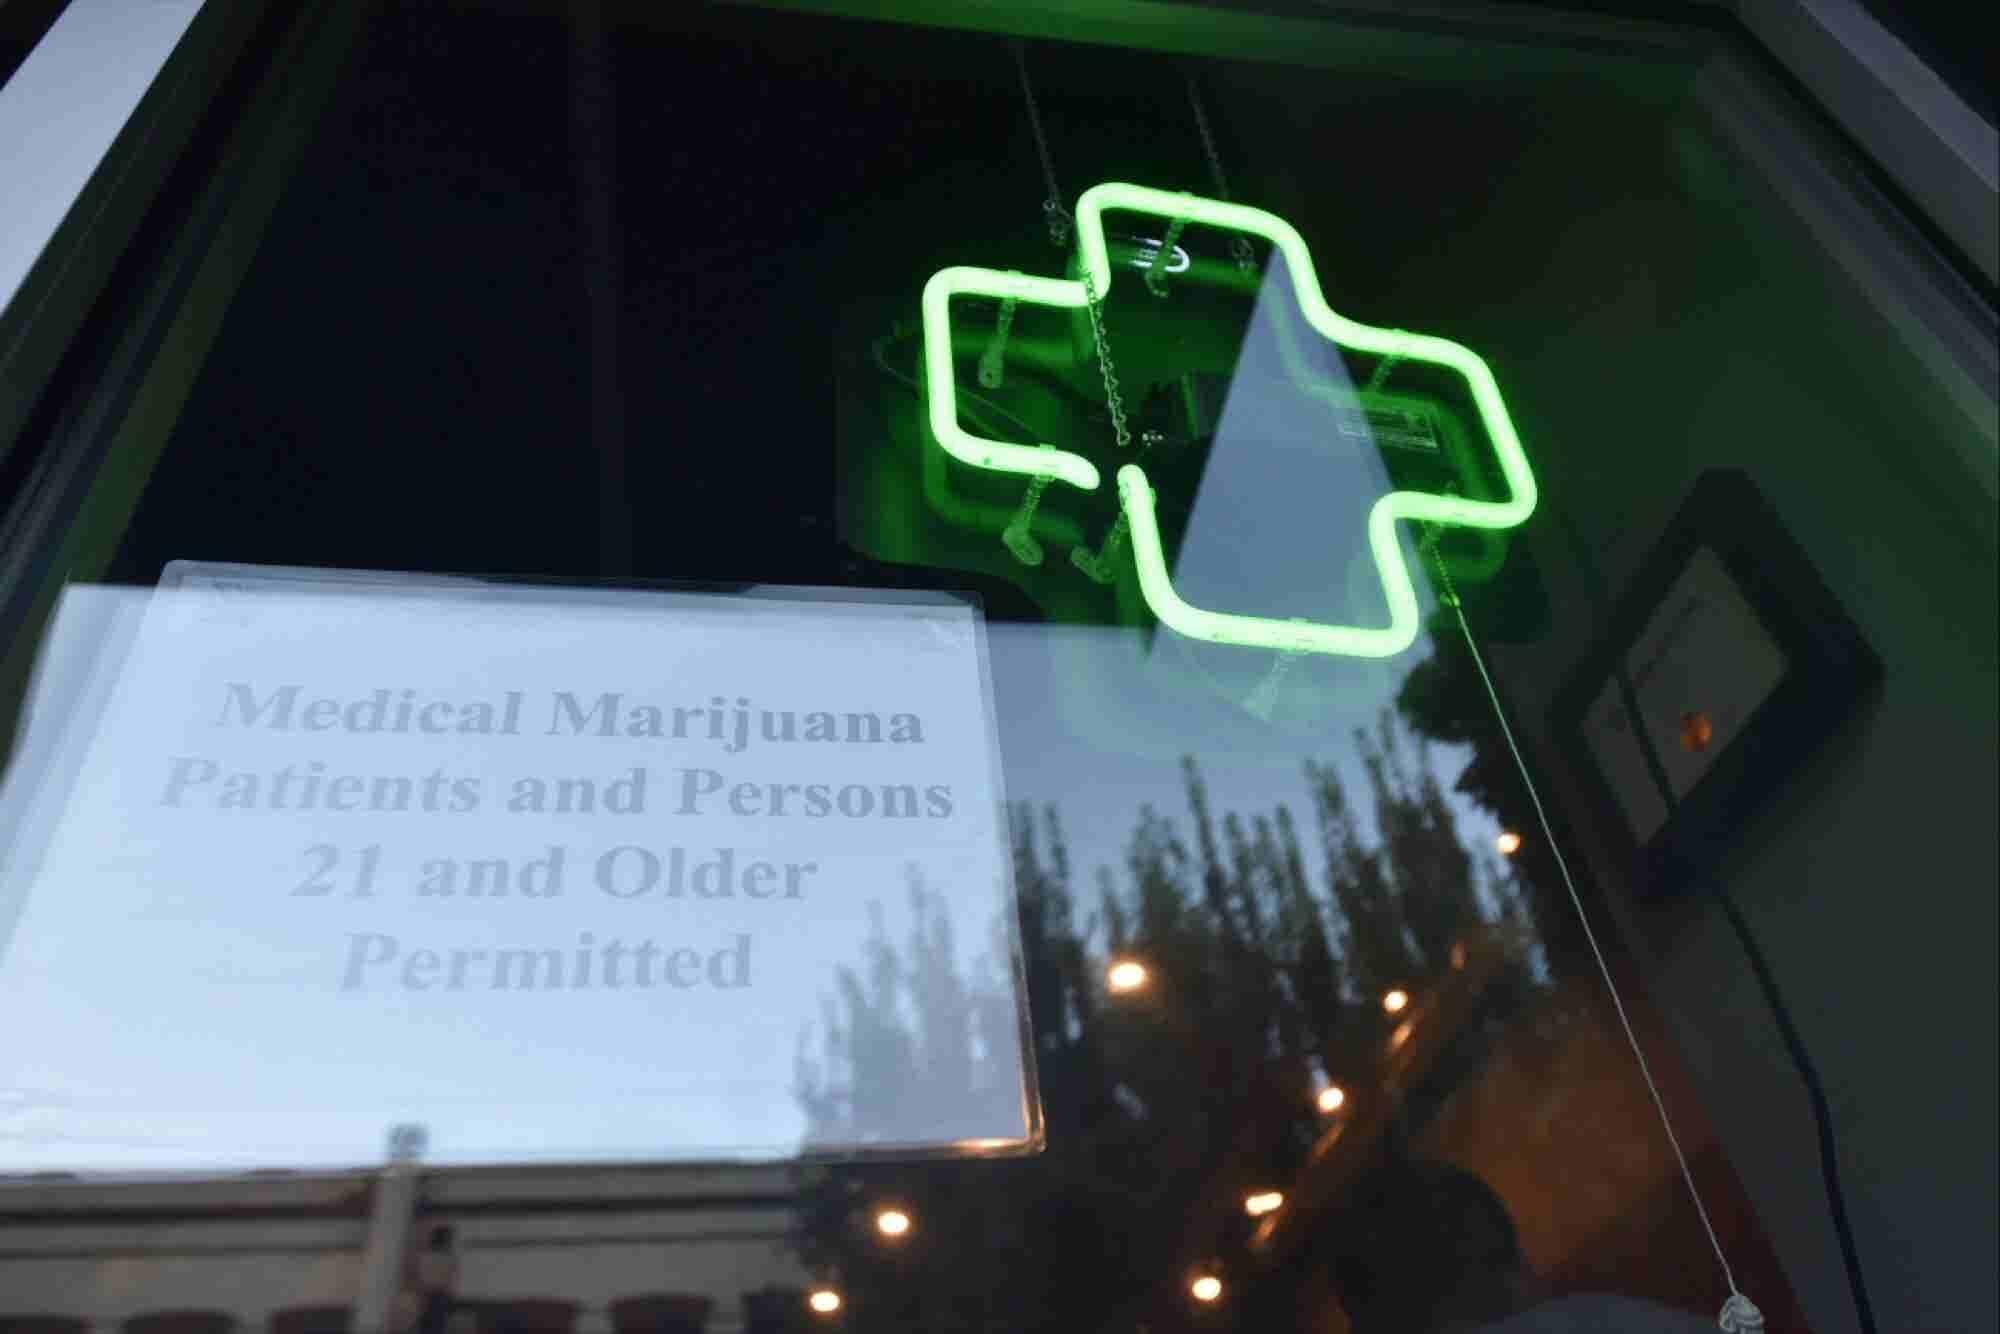 Cannabis Industry Raised $1 Billion in 2016